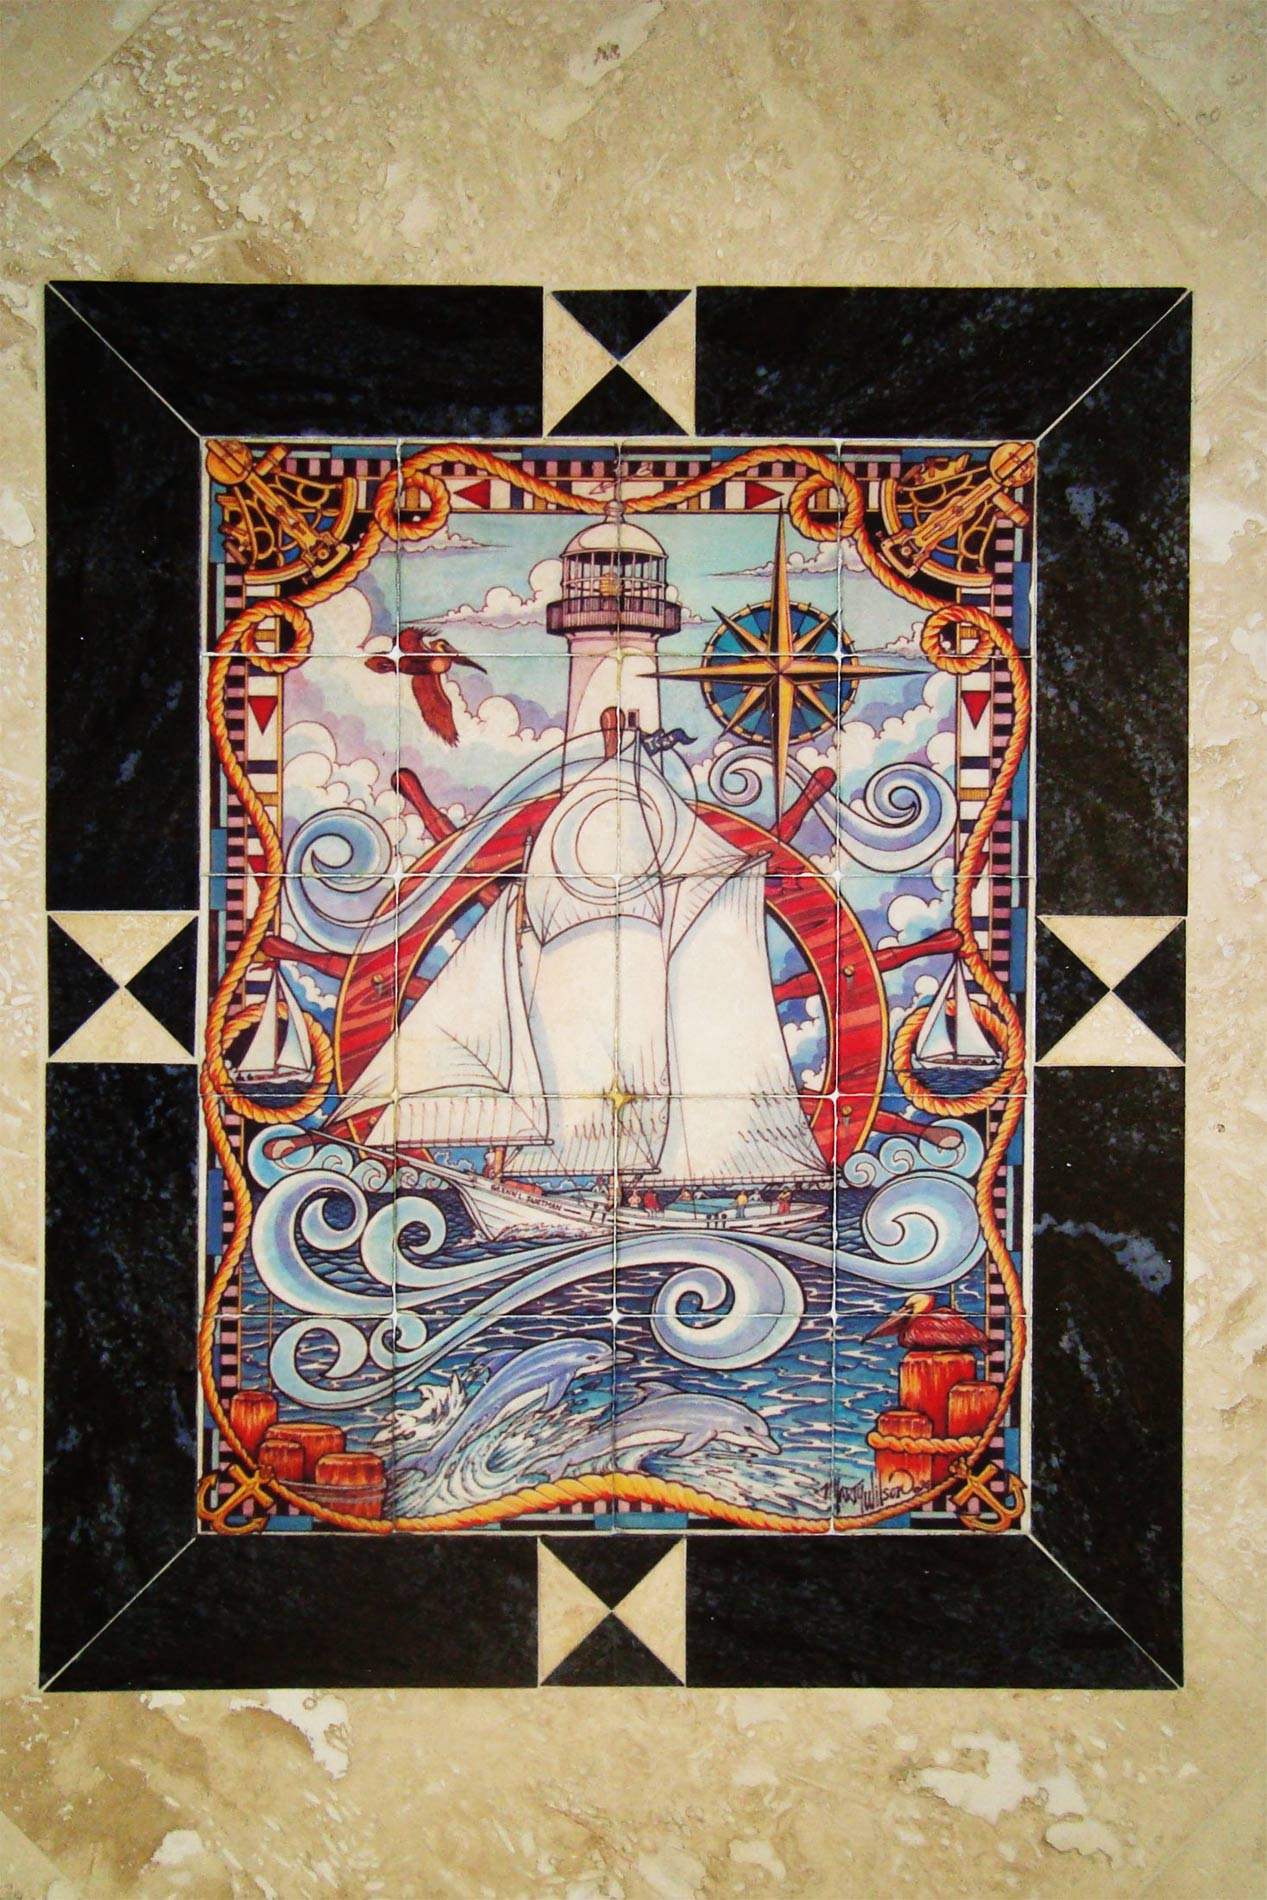 Custom tiles and tile mural pictures custom tile murals for Decorative tile mural